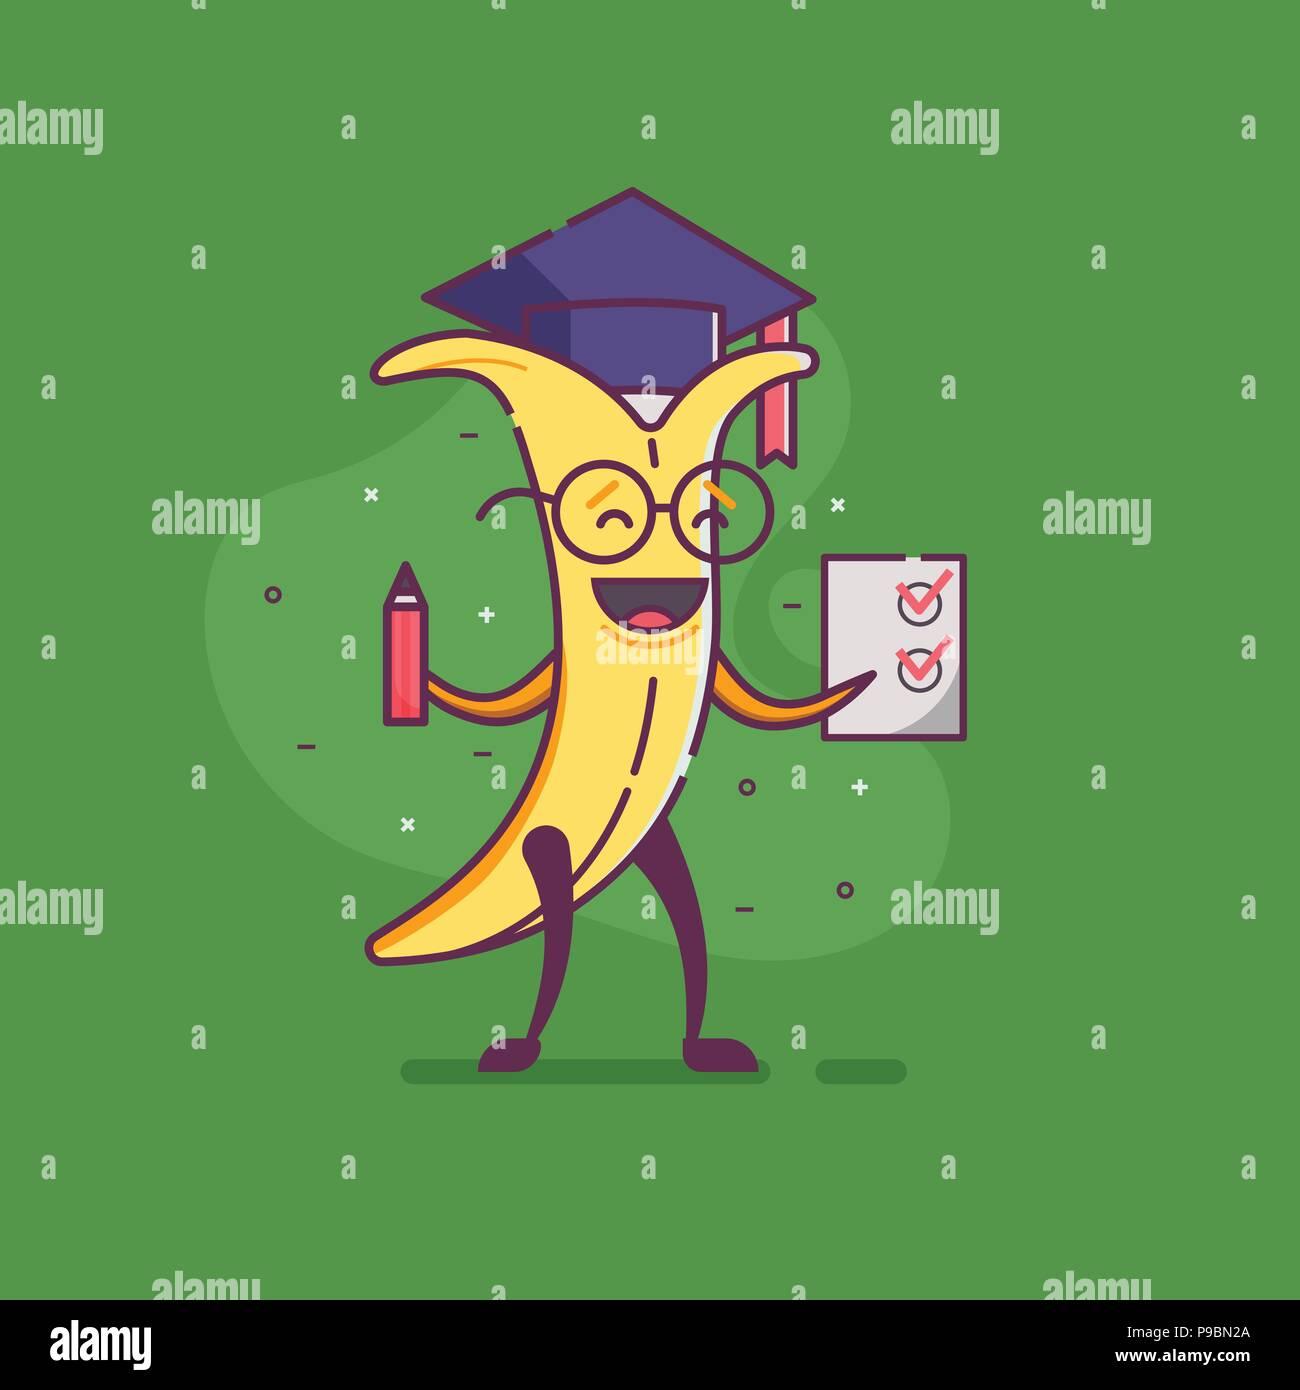 Lustige Cartoon Banana Absolvent Charakter Holding Papier Mit